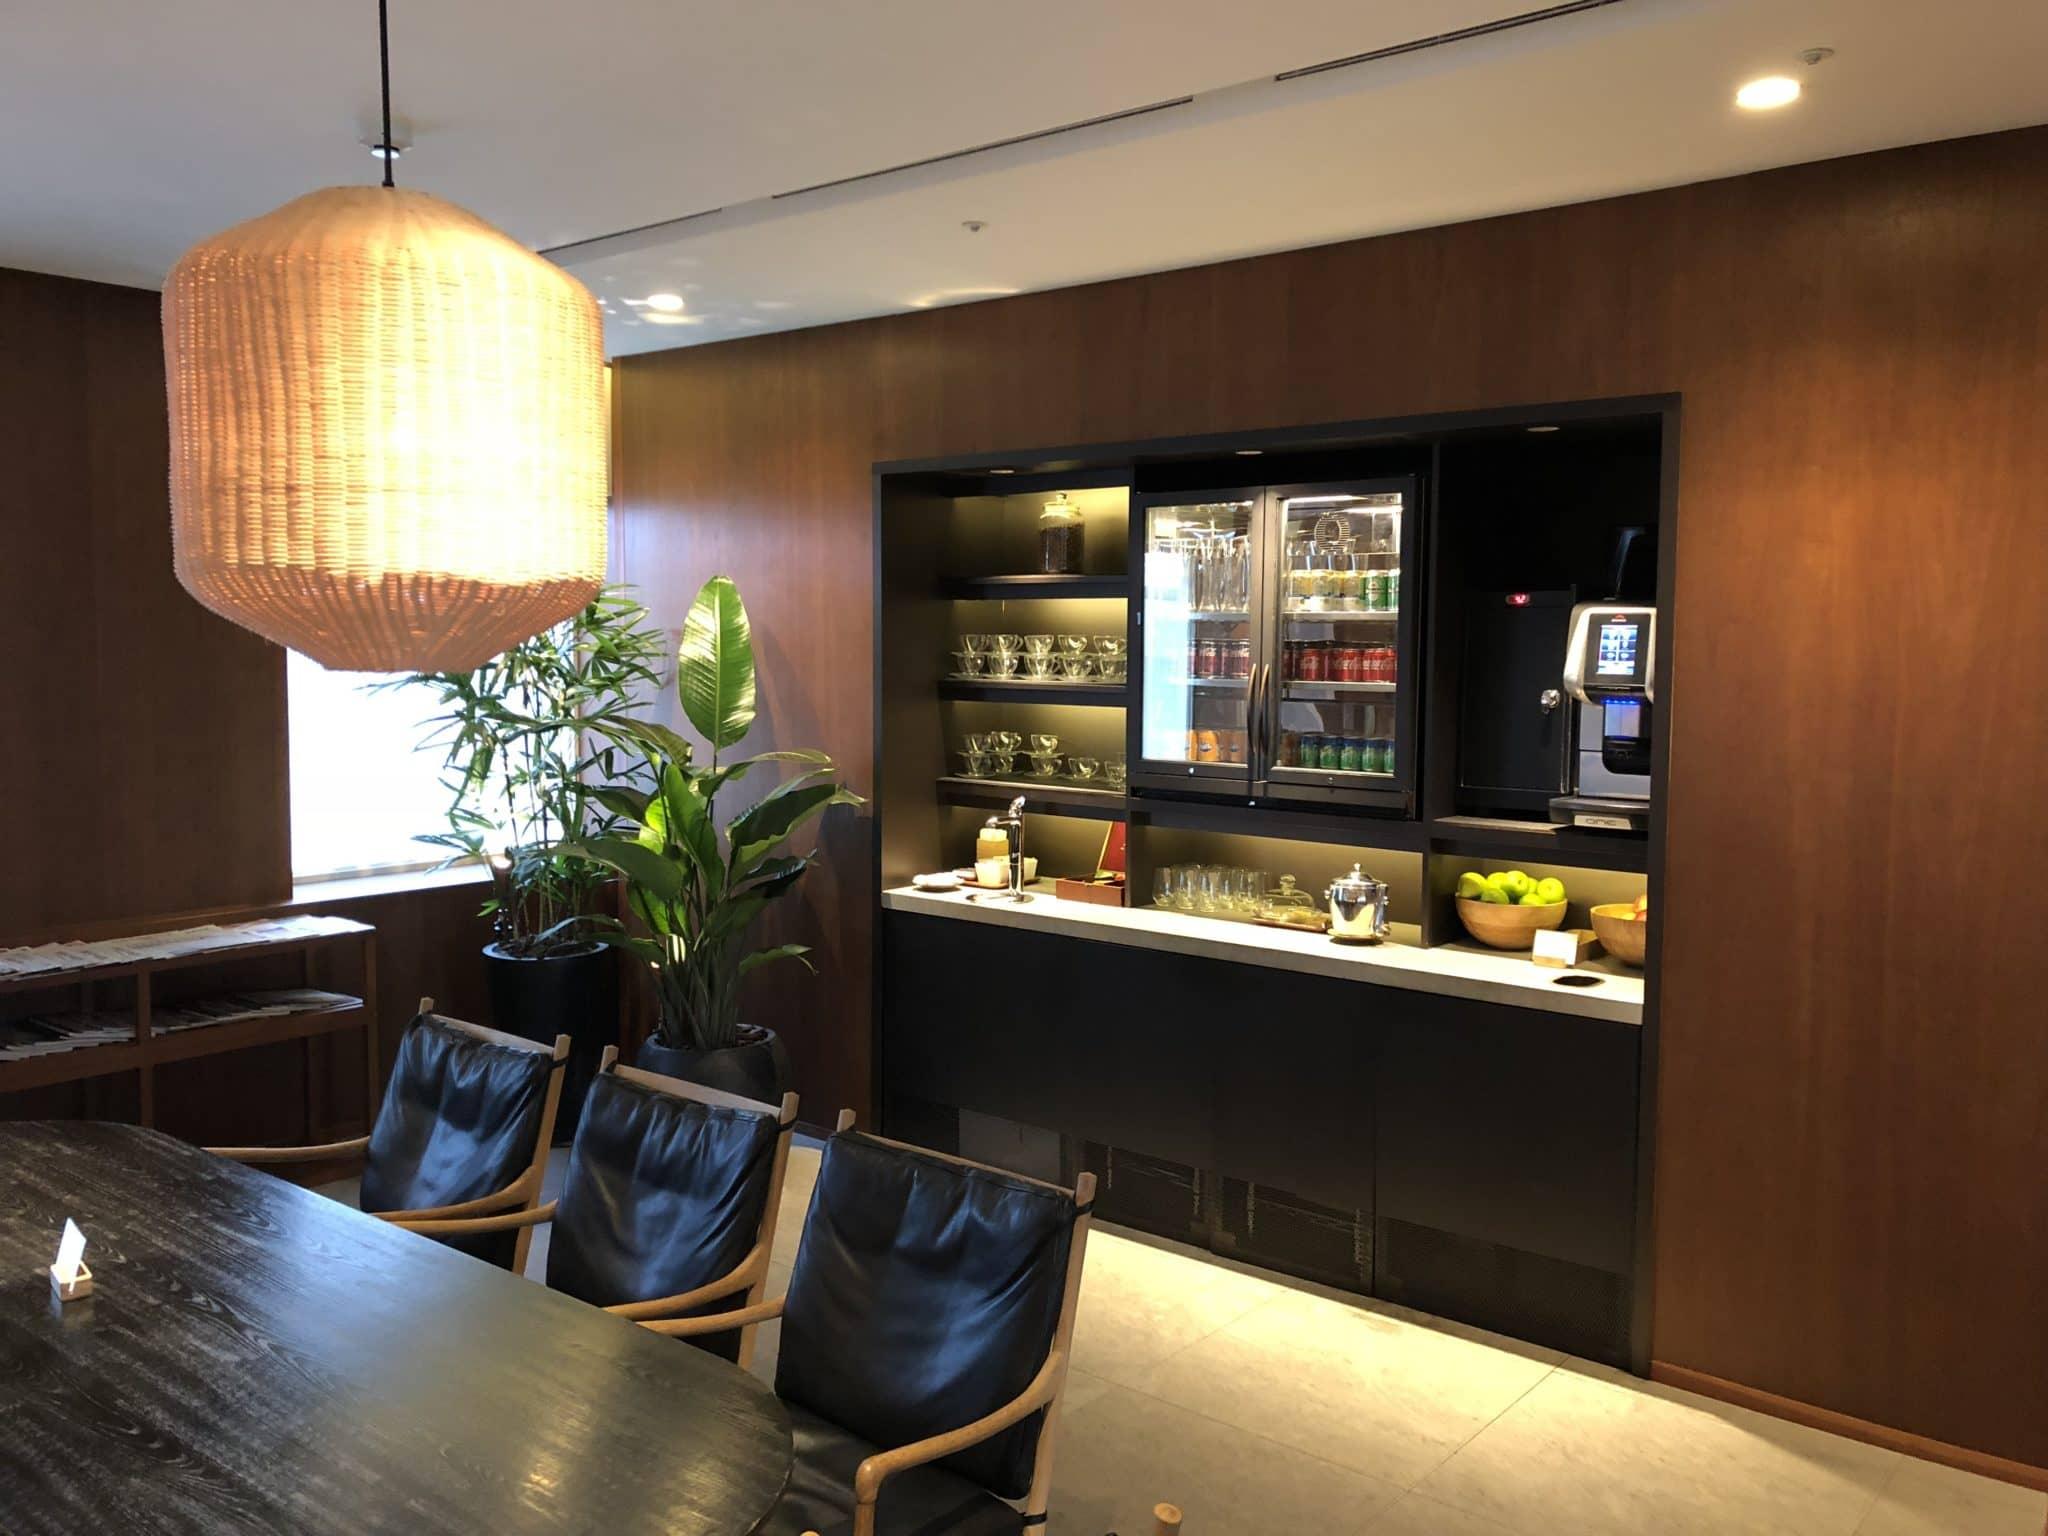 Cathay Pacific Business Class Lounge Taiwan-Taoyuan Getraenke und Kaffee